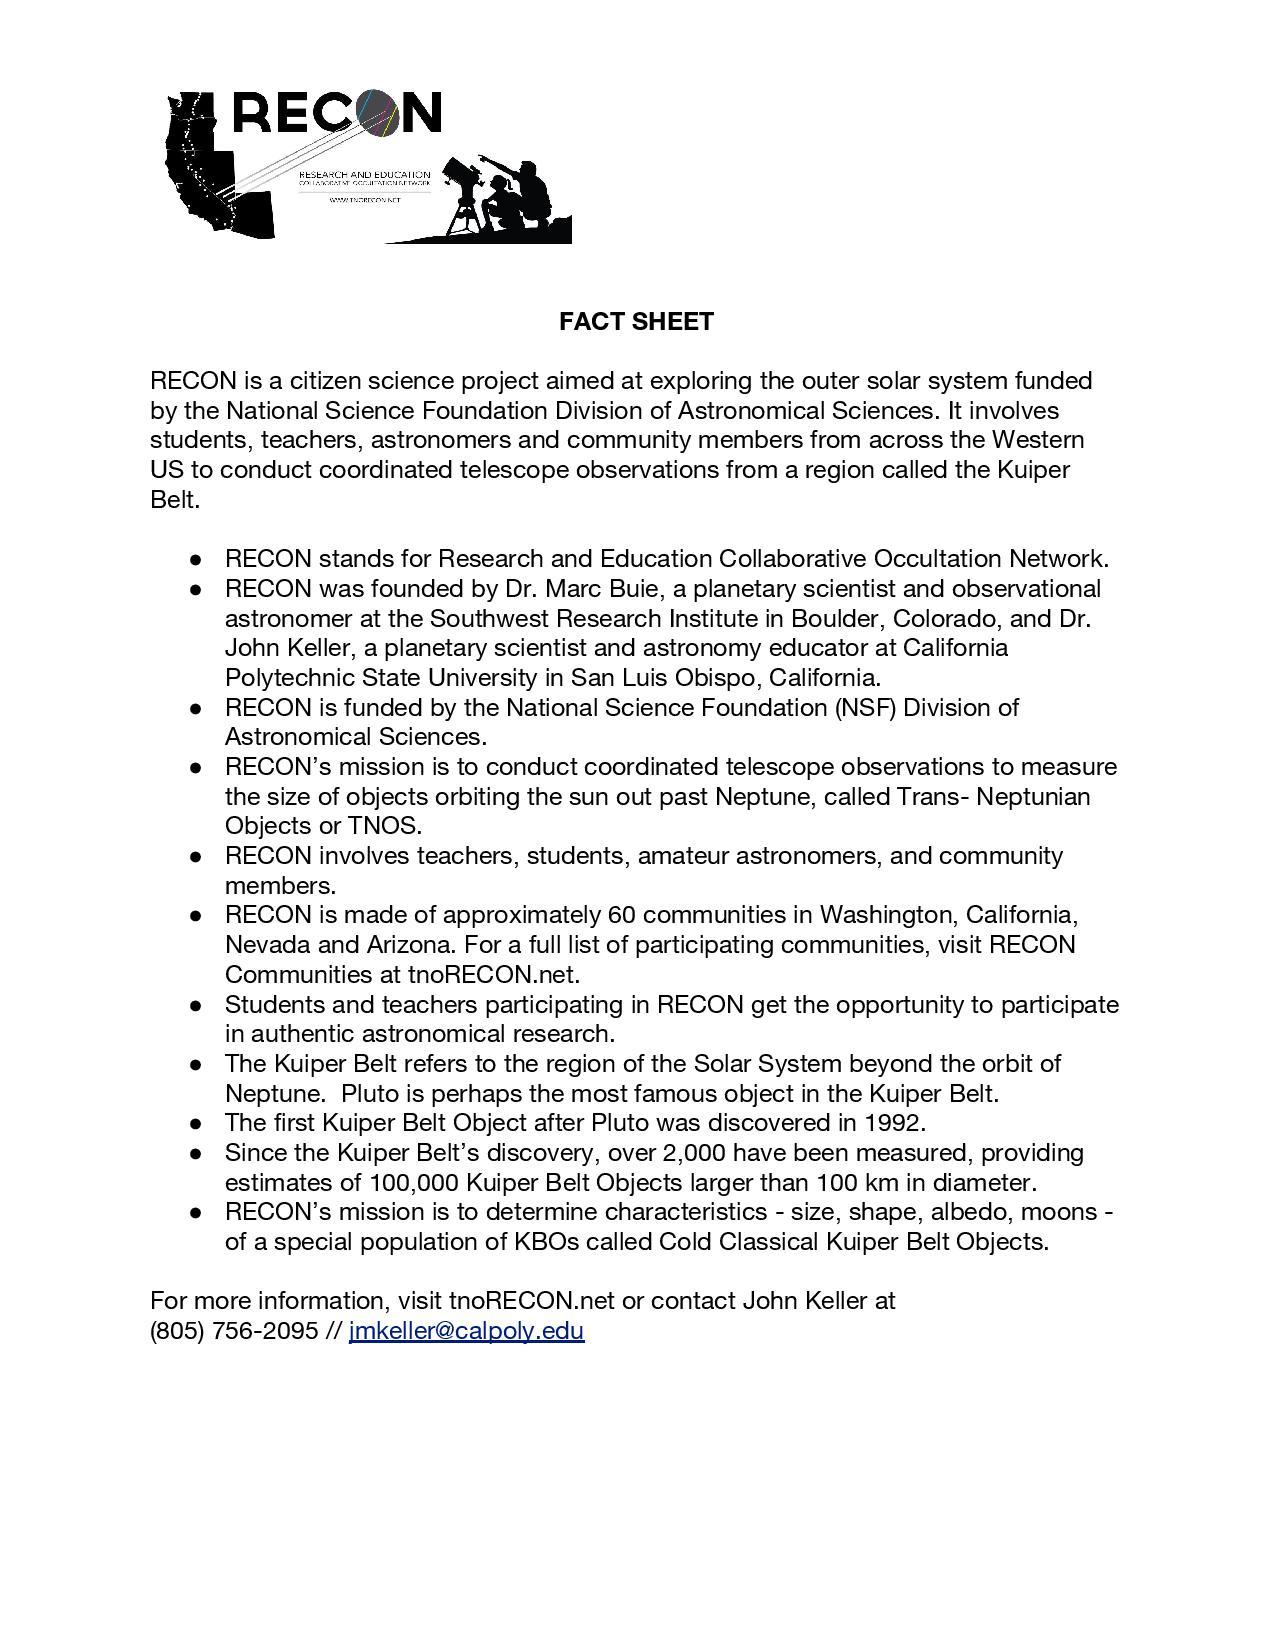 RECONFactSheet.doc (1)-page-001